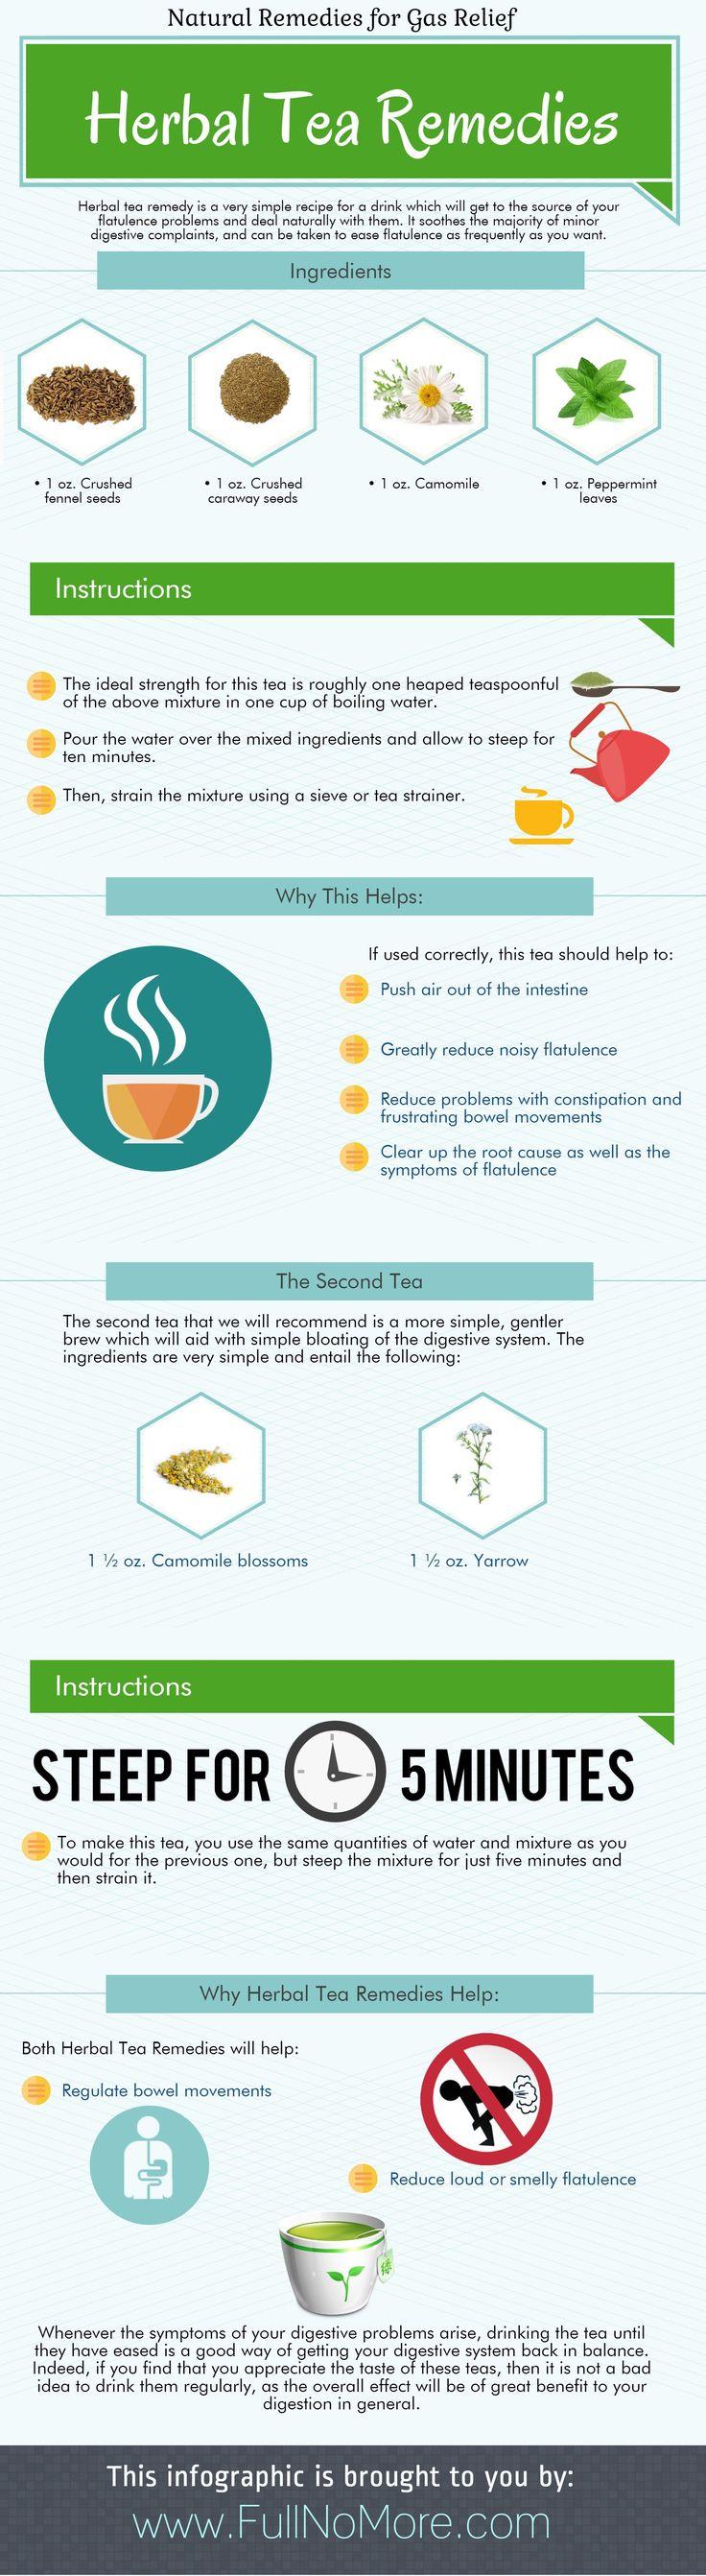 Herbal Tea Remedies to Stop Flatulence Fast!